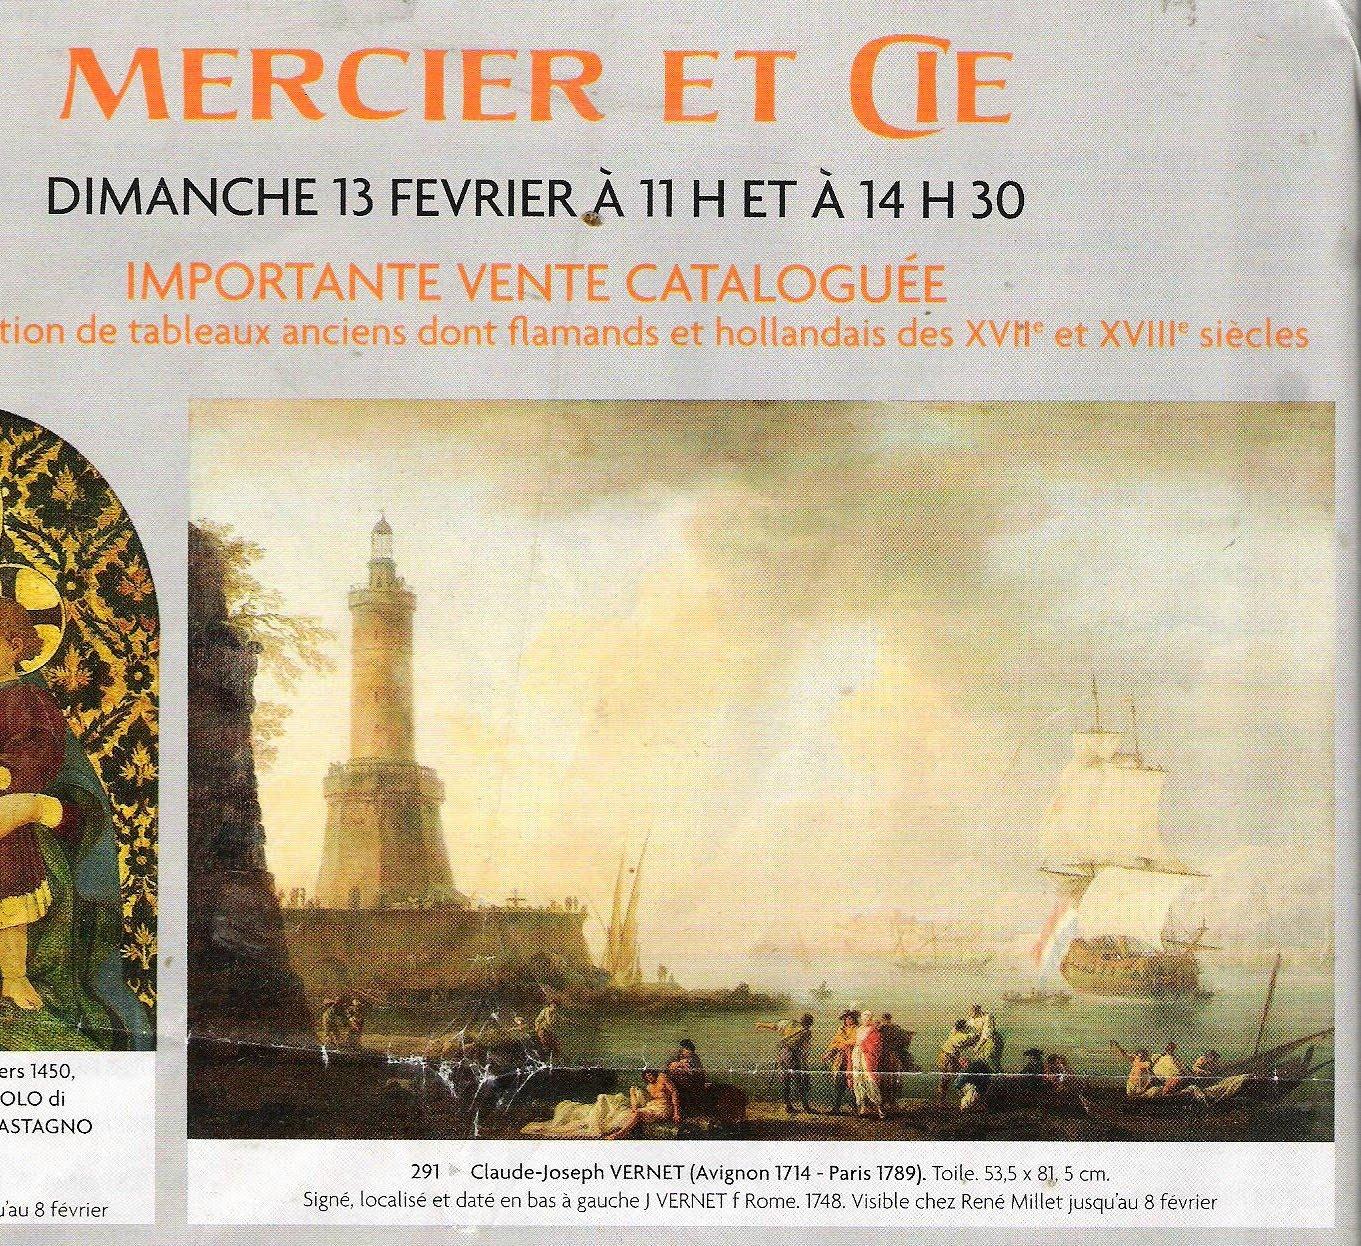 historic marine france vente de toiles de vernet claude joseph avignon 1714 paris 1789. Black Bedroom Furniture Sets. Home Design Ideas